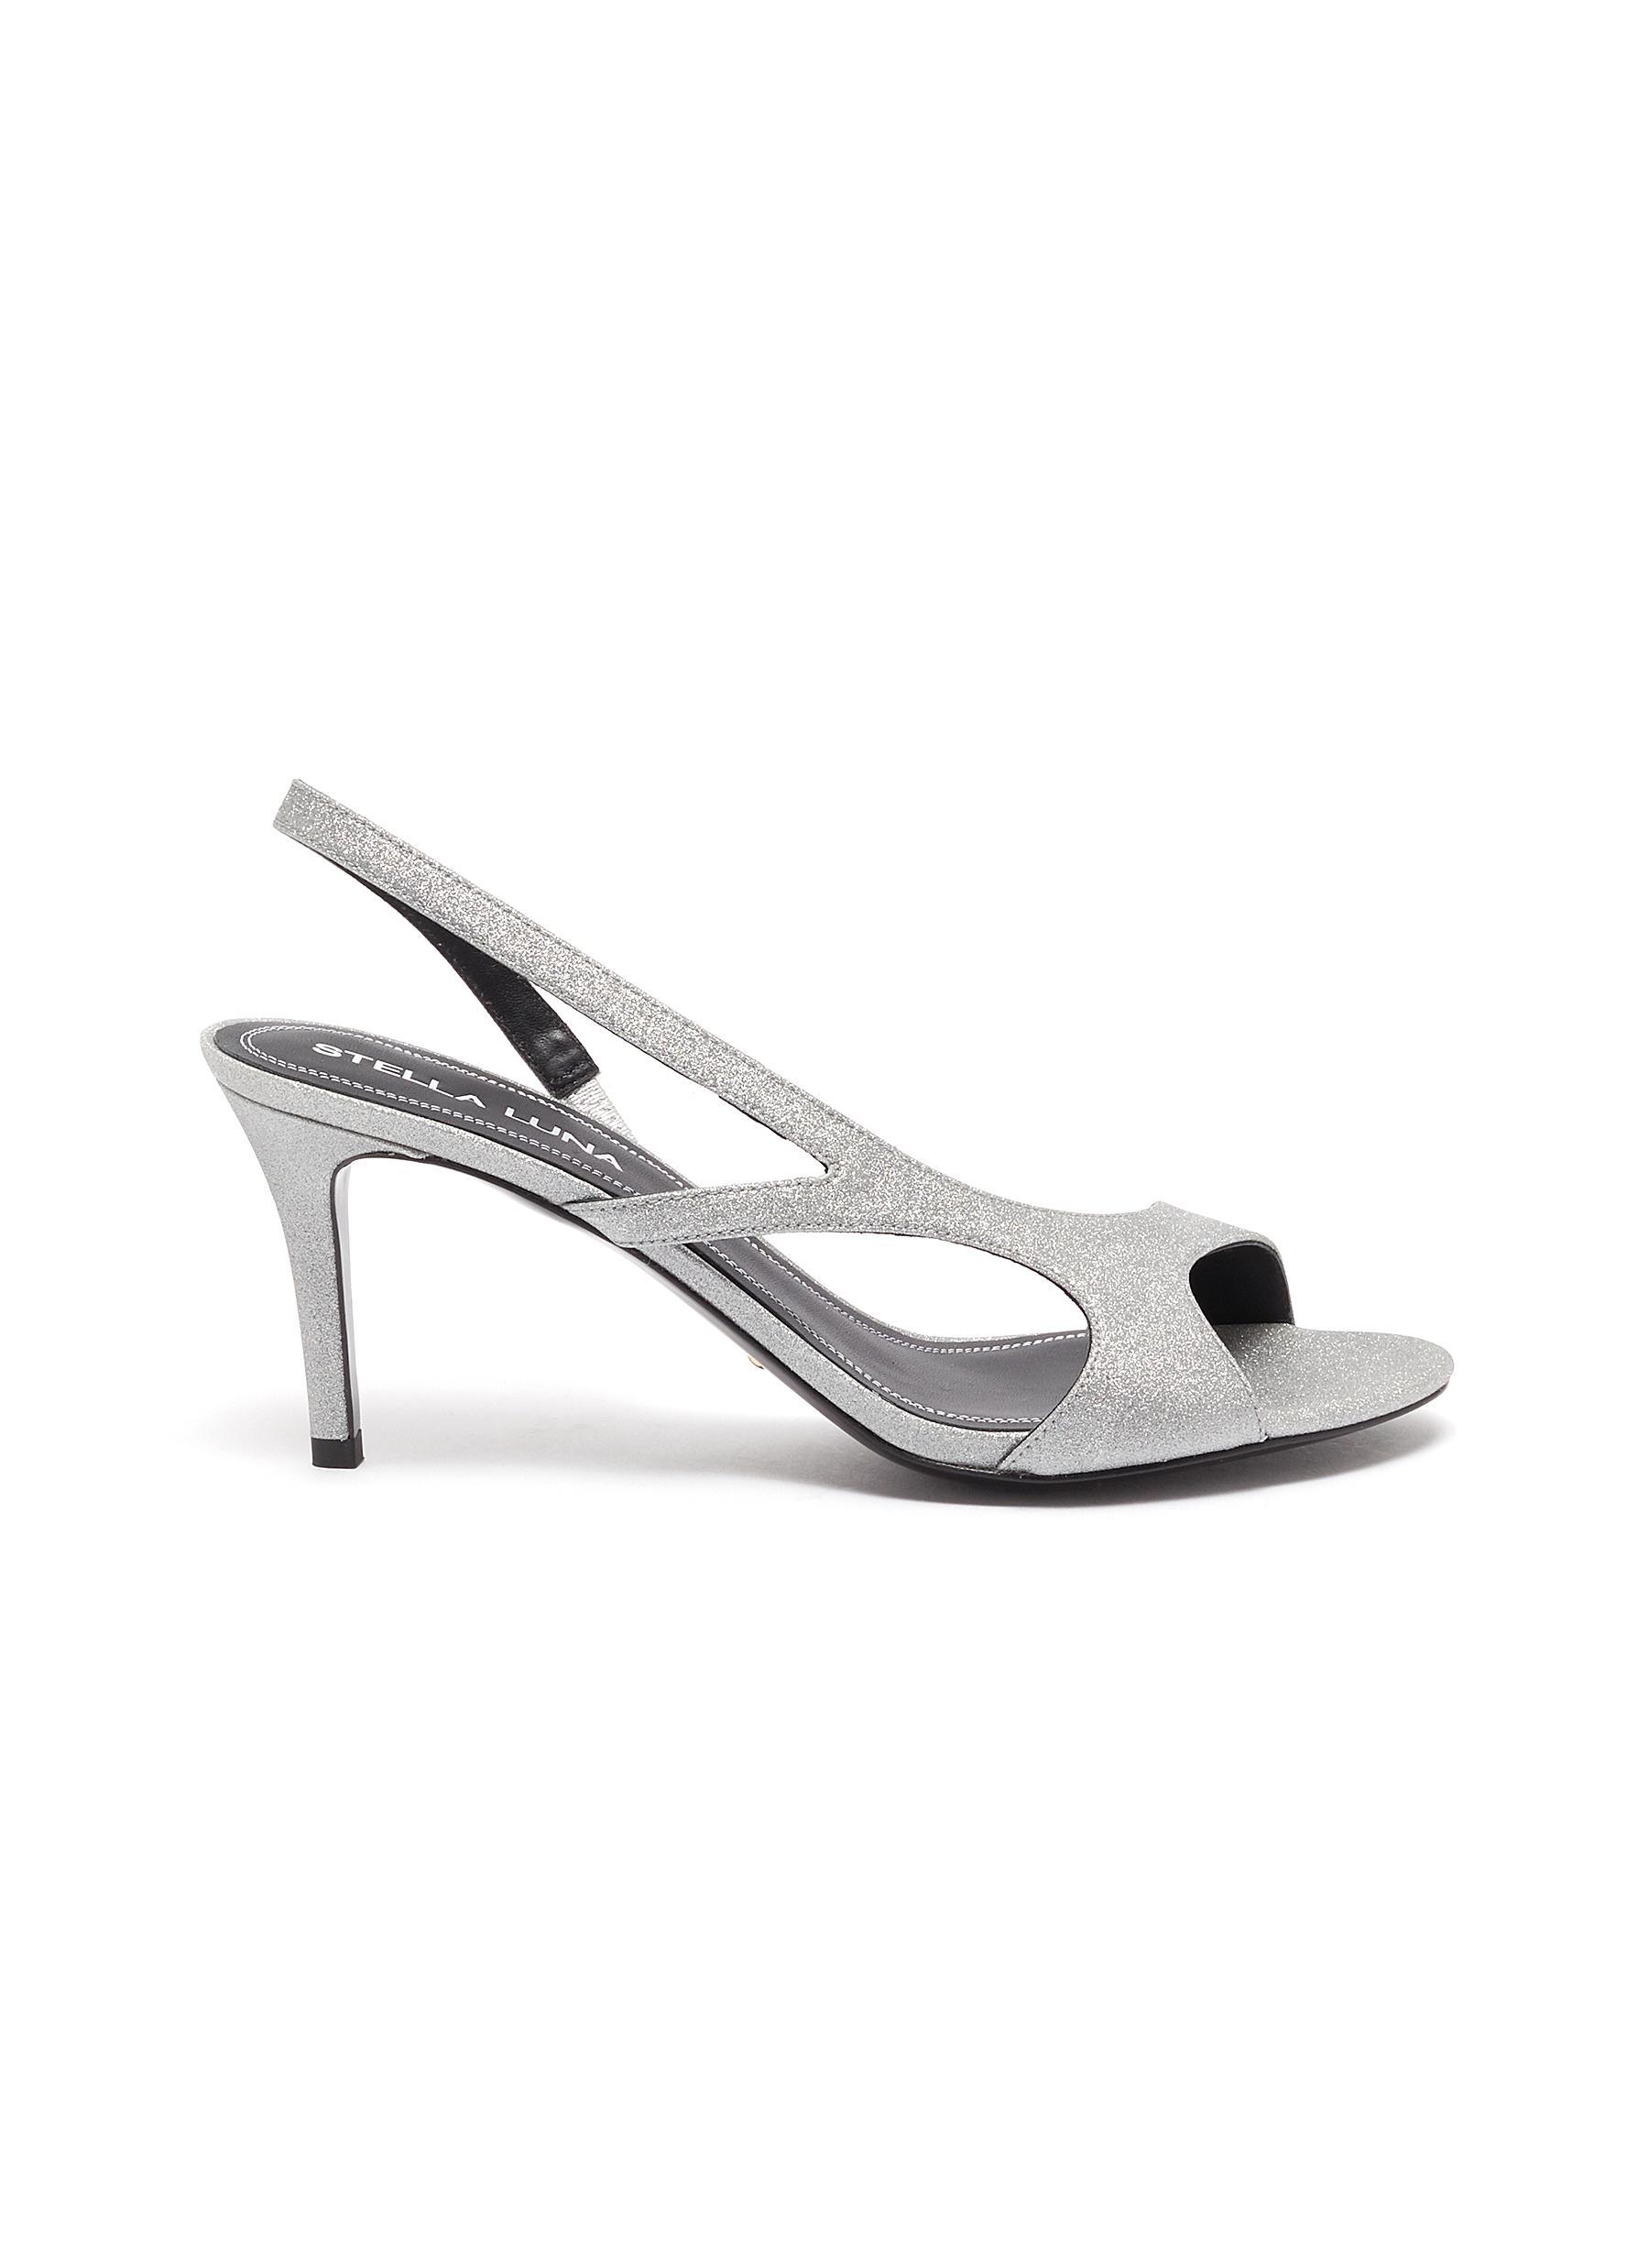 Stella Luna High Heels Asymmetric strap open toe leather sandals